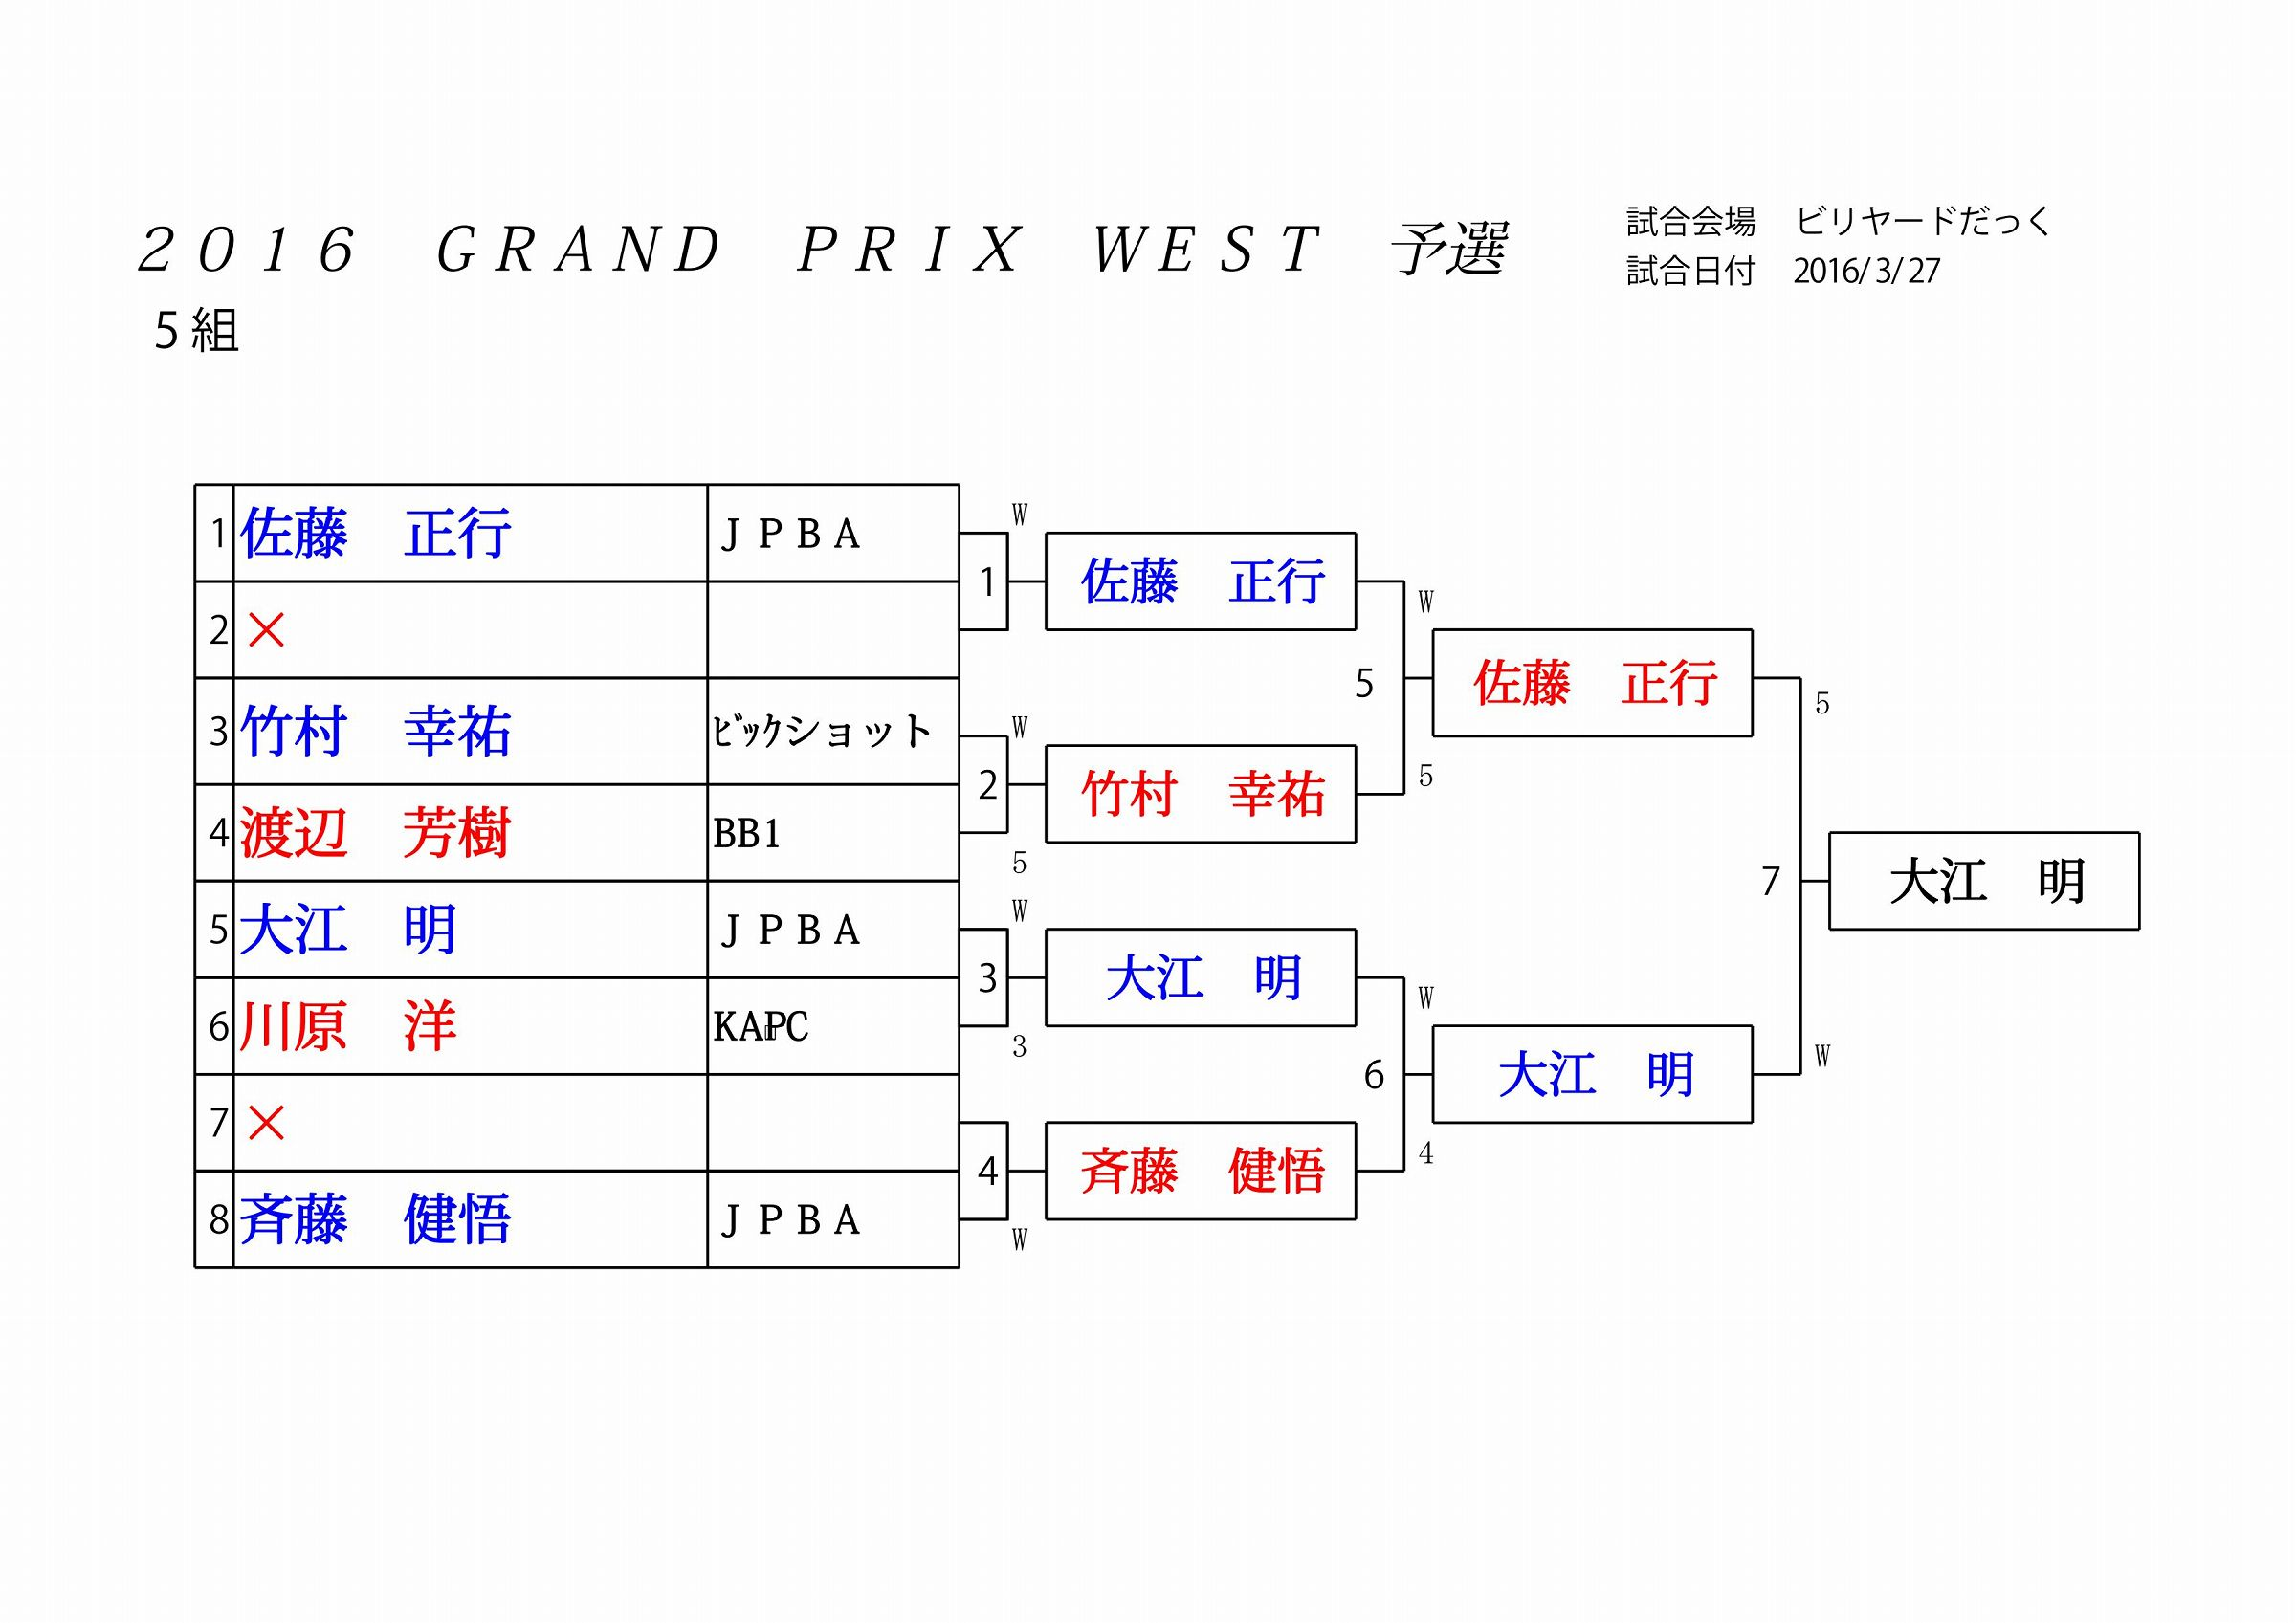 2016 GRAND PRIX WEST 予選_05